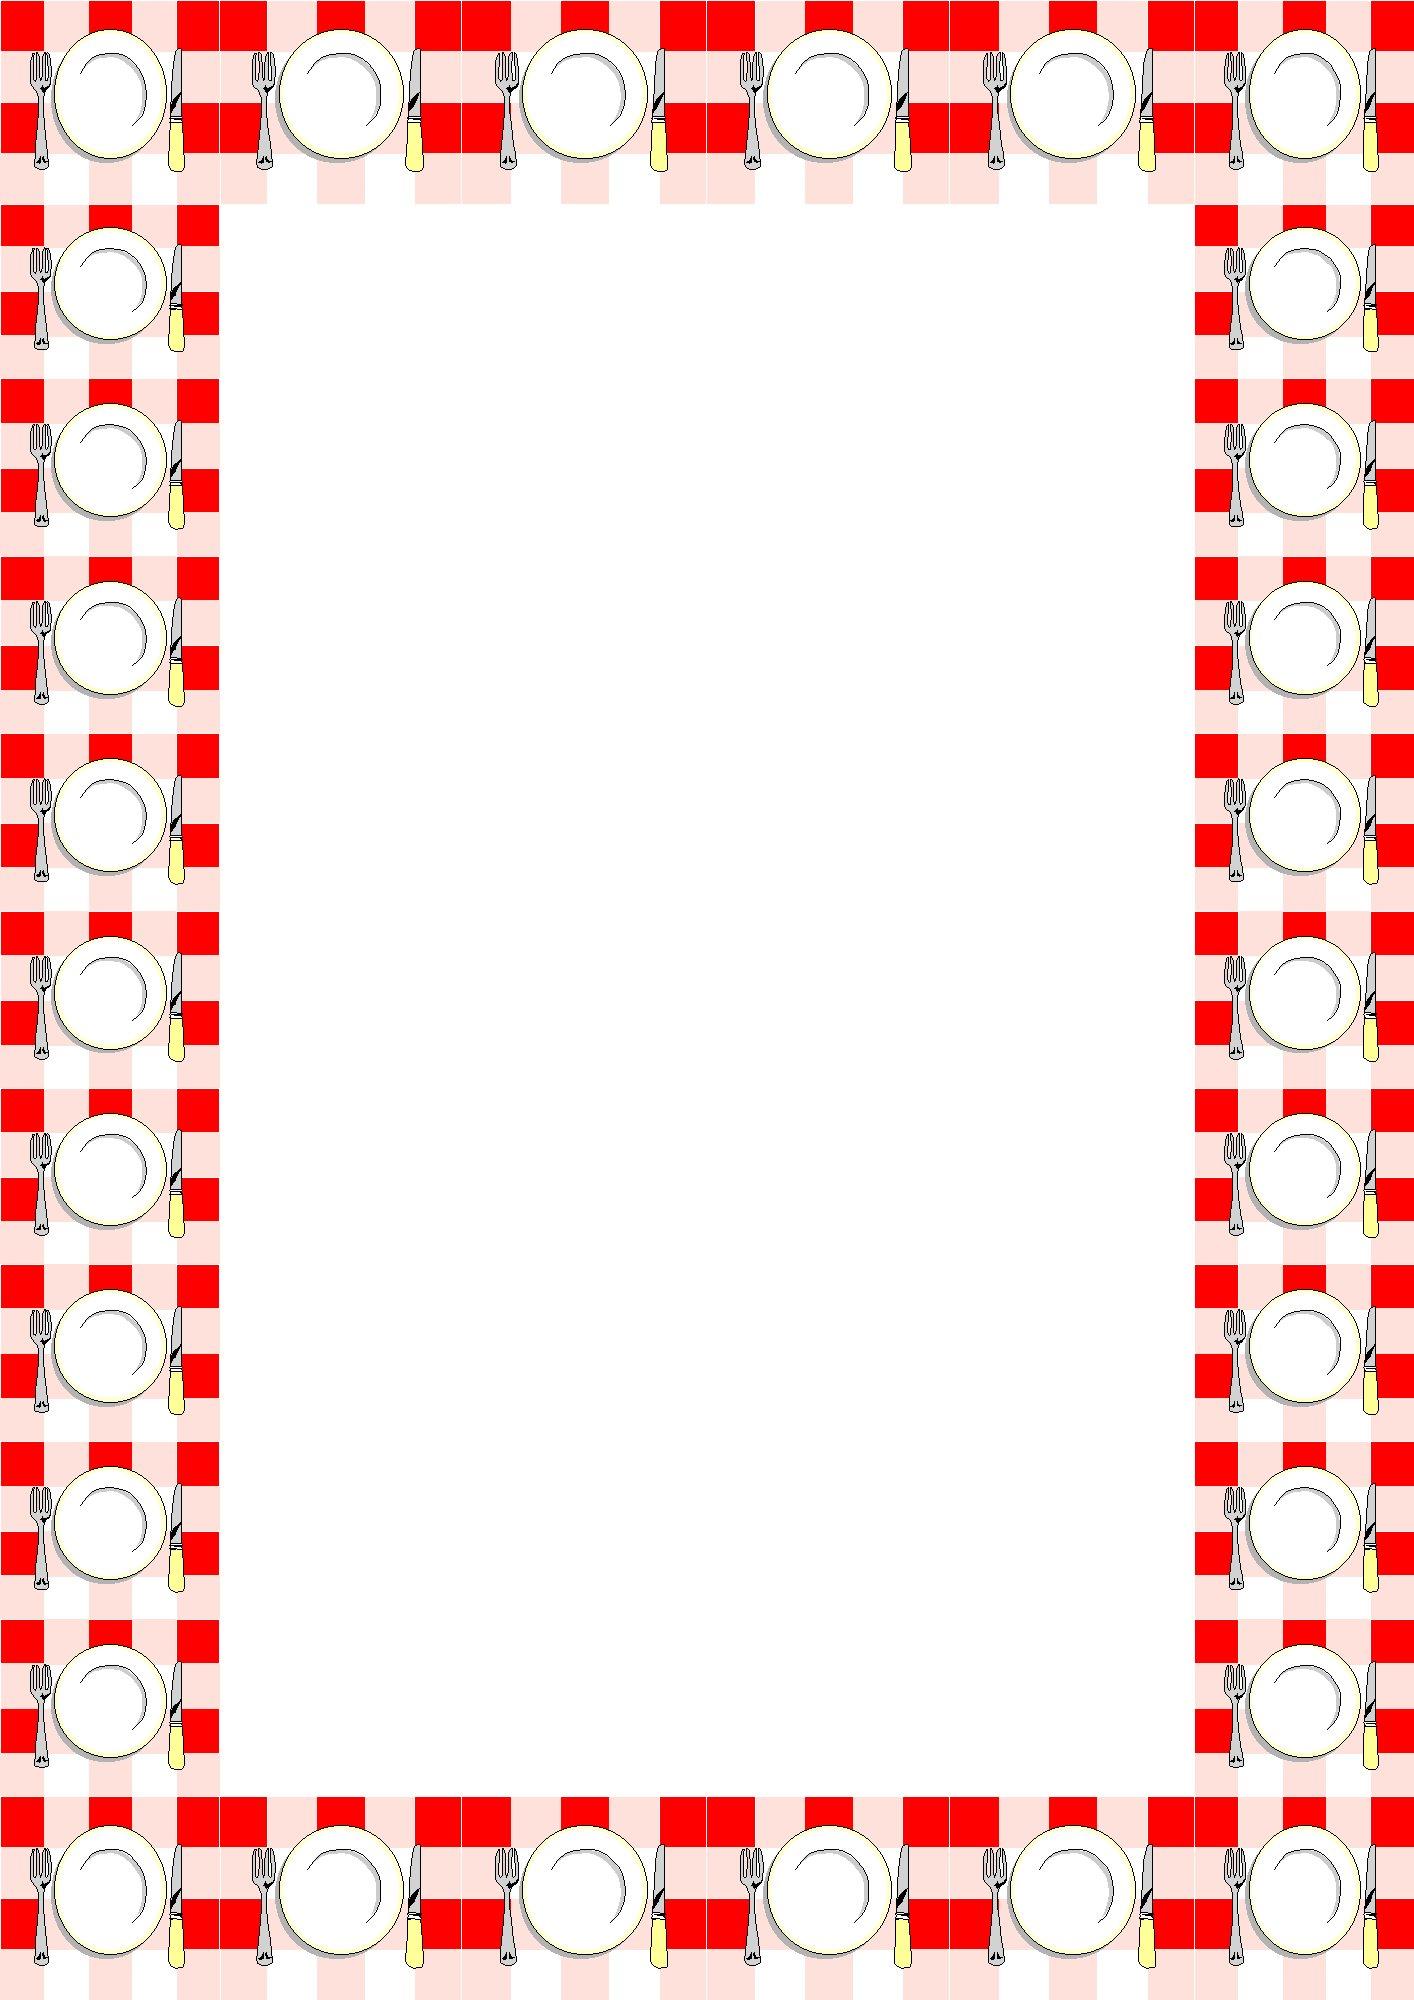 Free Restaurant Cliparts Border, Download Free Clip Art.